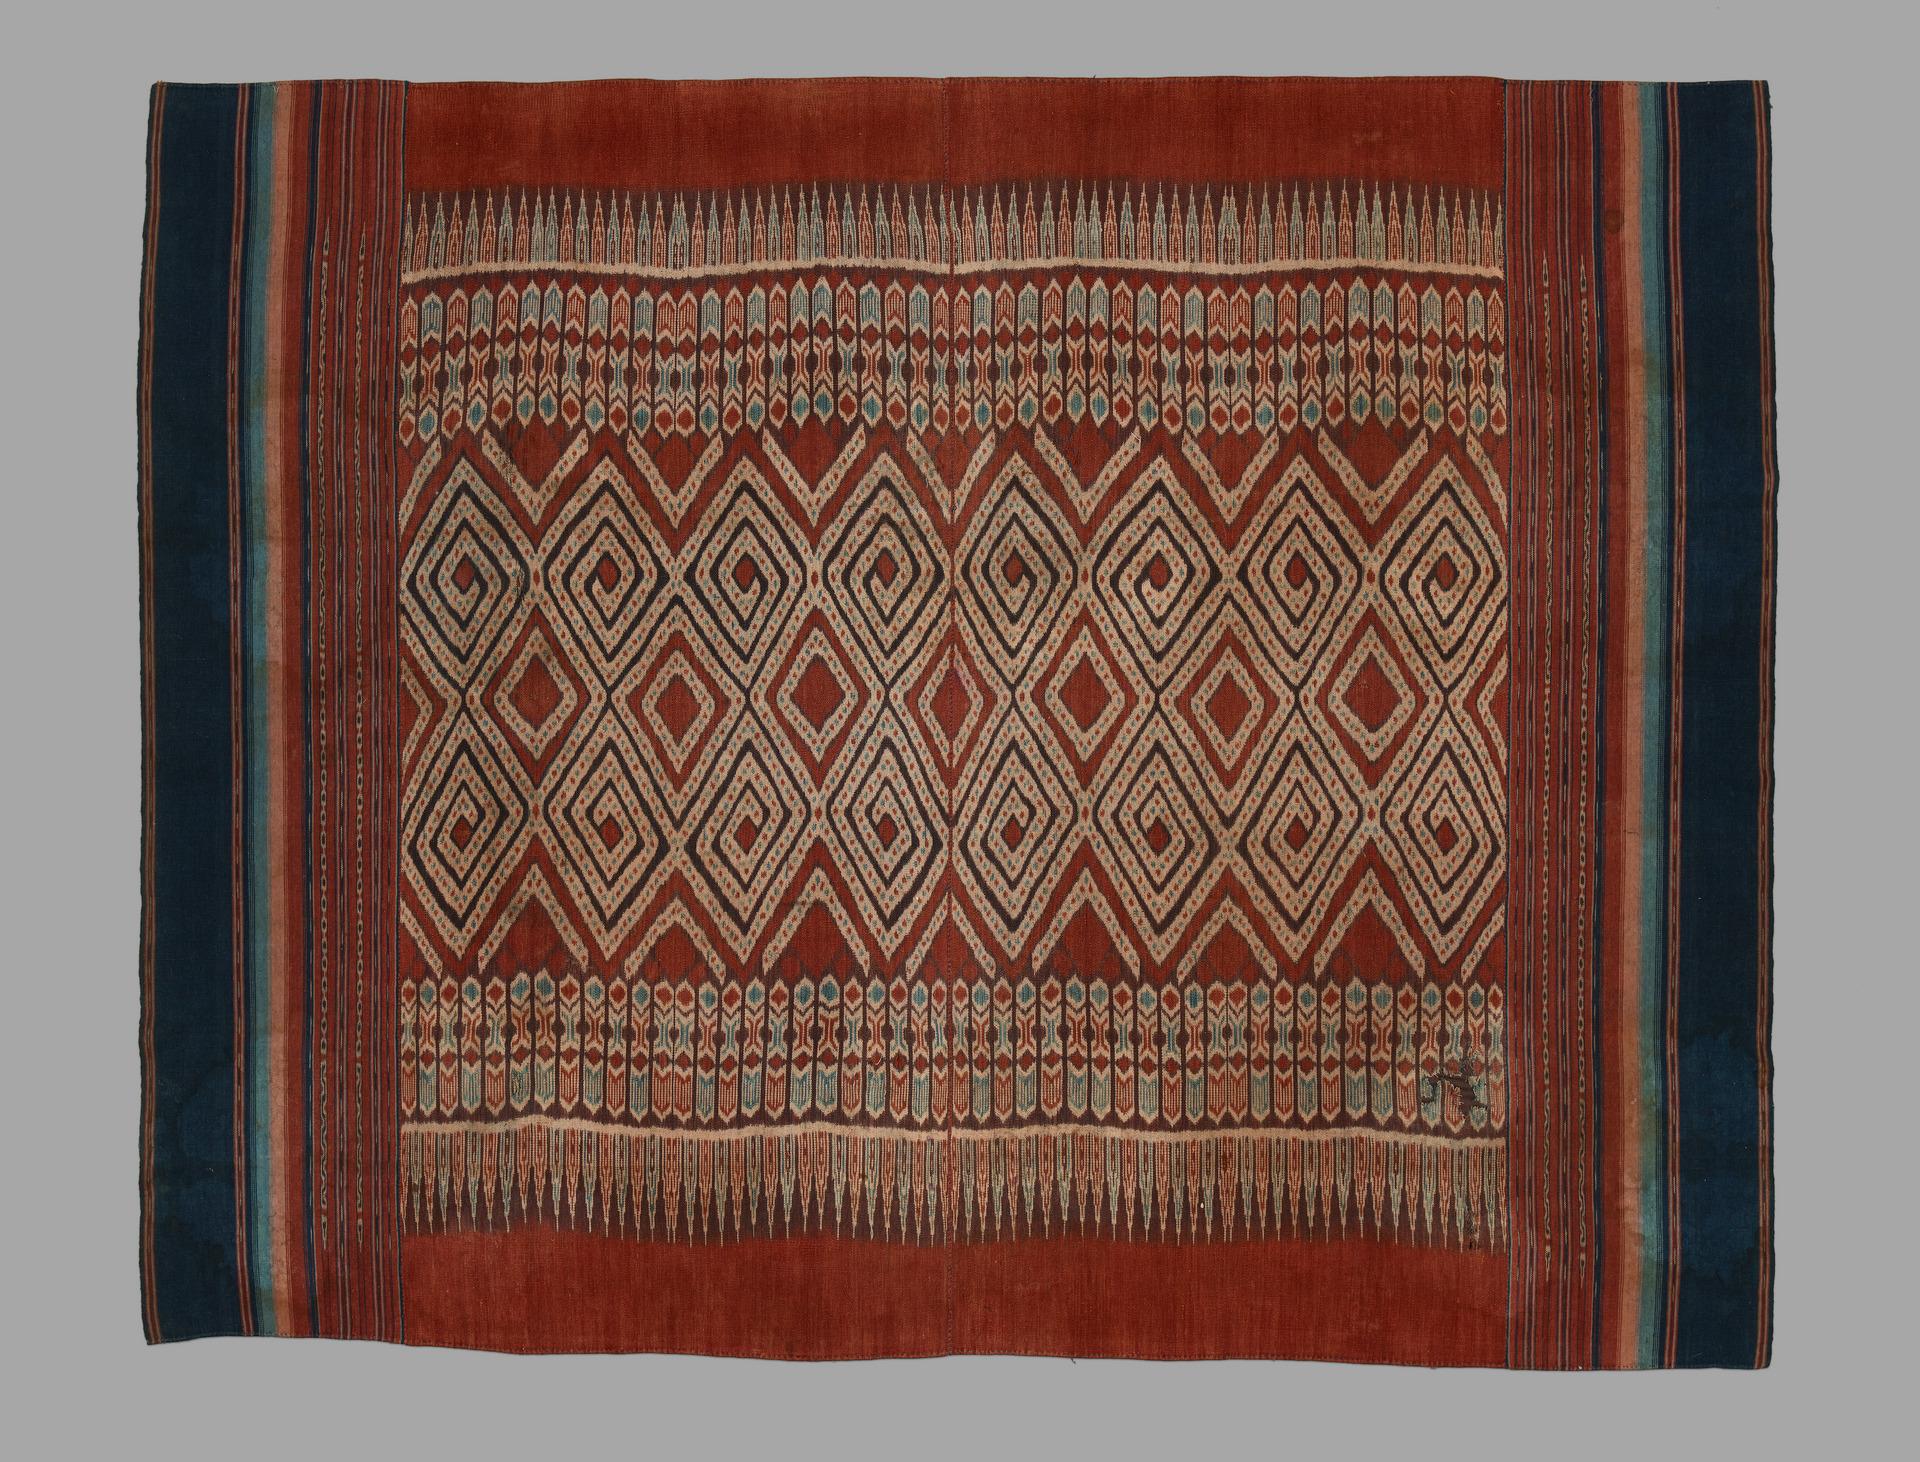 Ikat Ceremonial Hanging or Shroud | Toraja Peoples | Sulawesi © Yale University Art Gallery | Connecticut, USA